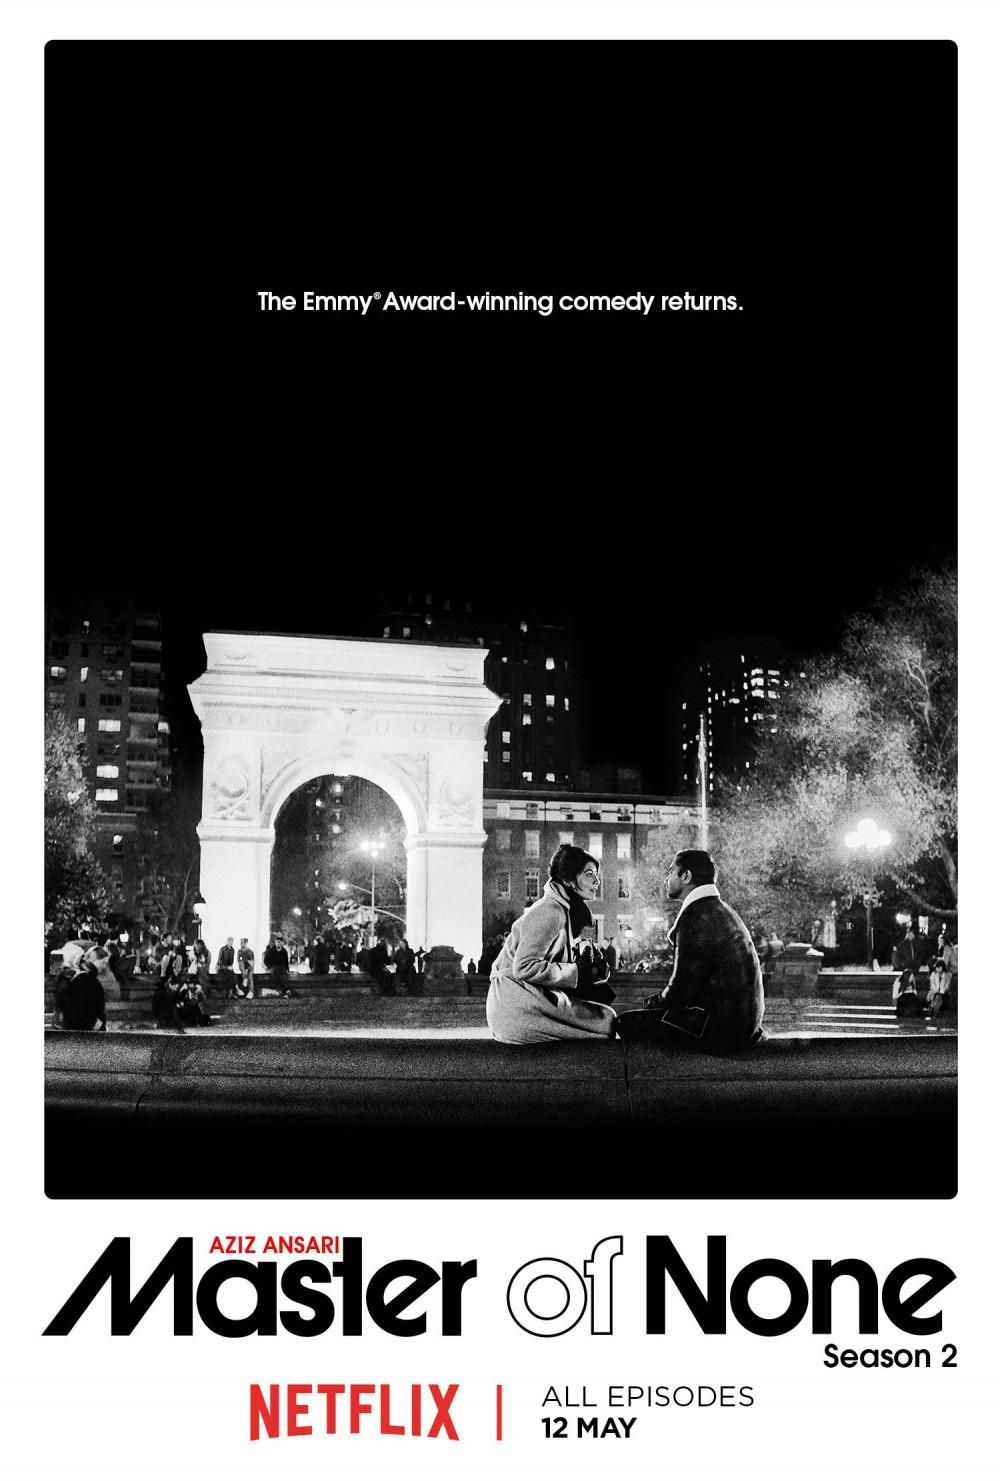 aziz ansari 39 s master of none season 2 lands trailer posters filmoria. Black Bedroom Furniture Sets. Home Design Ideas